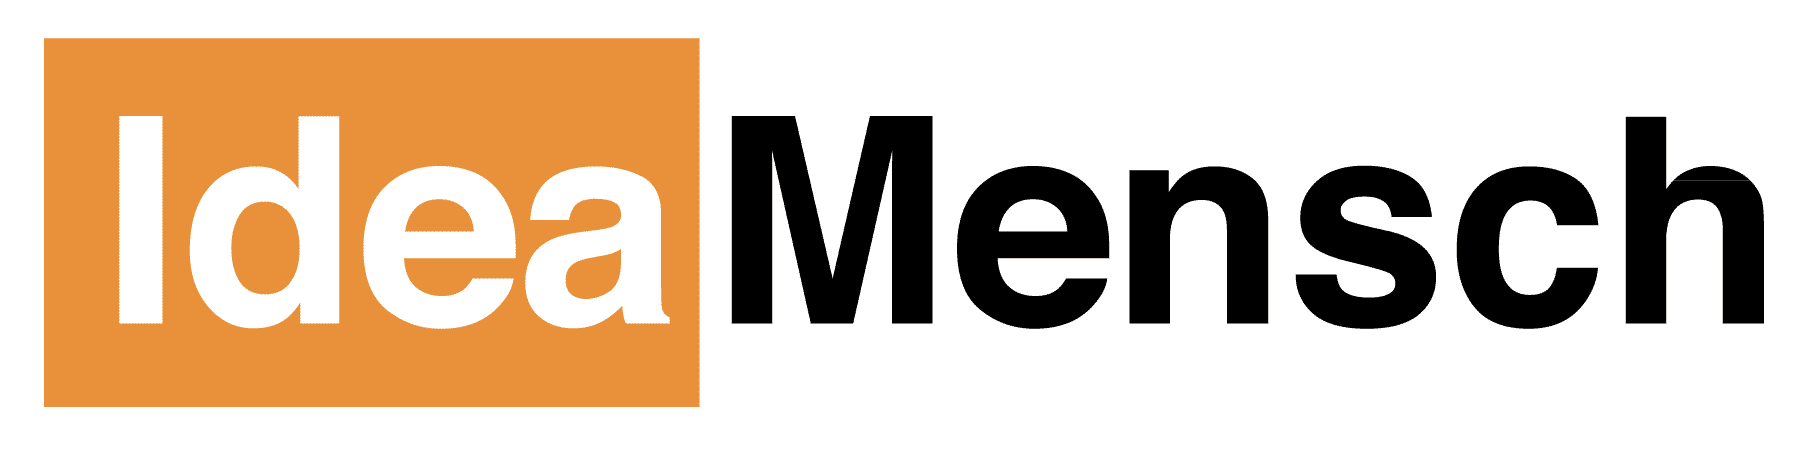 IdeaMensch-logo-high-res.png